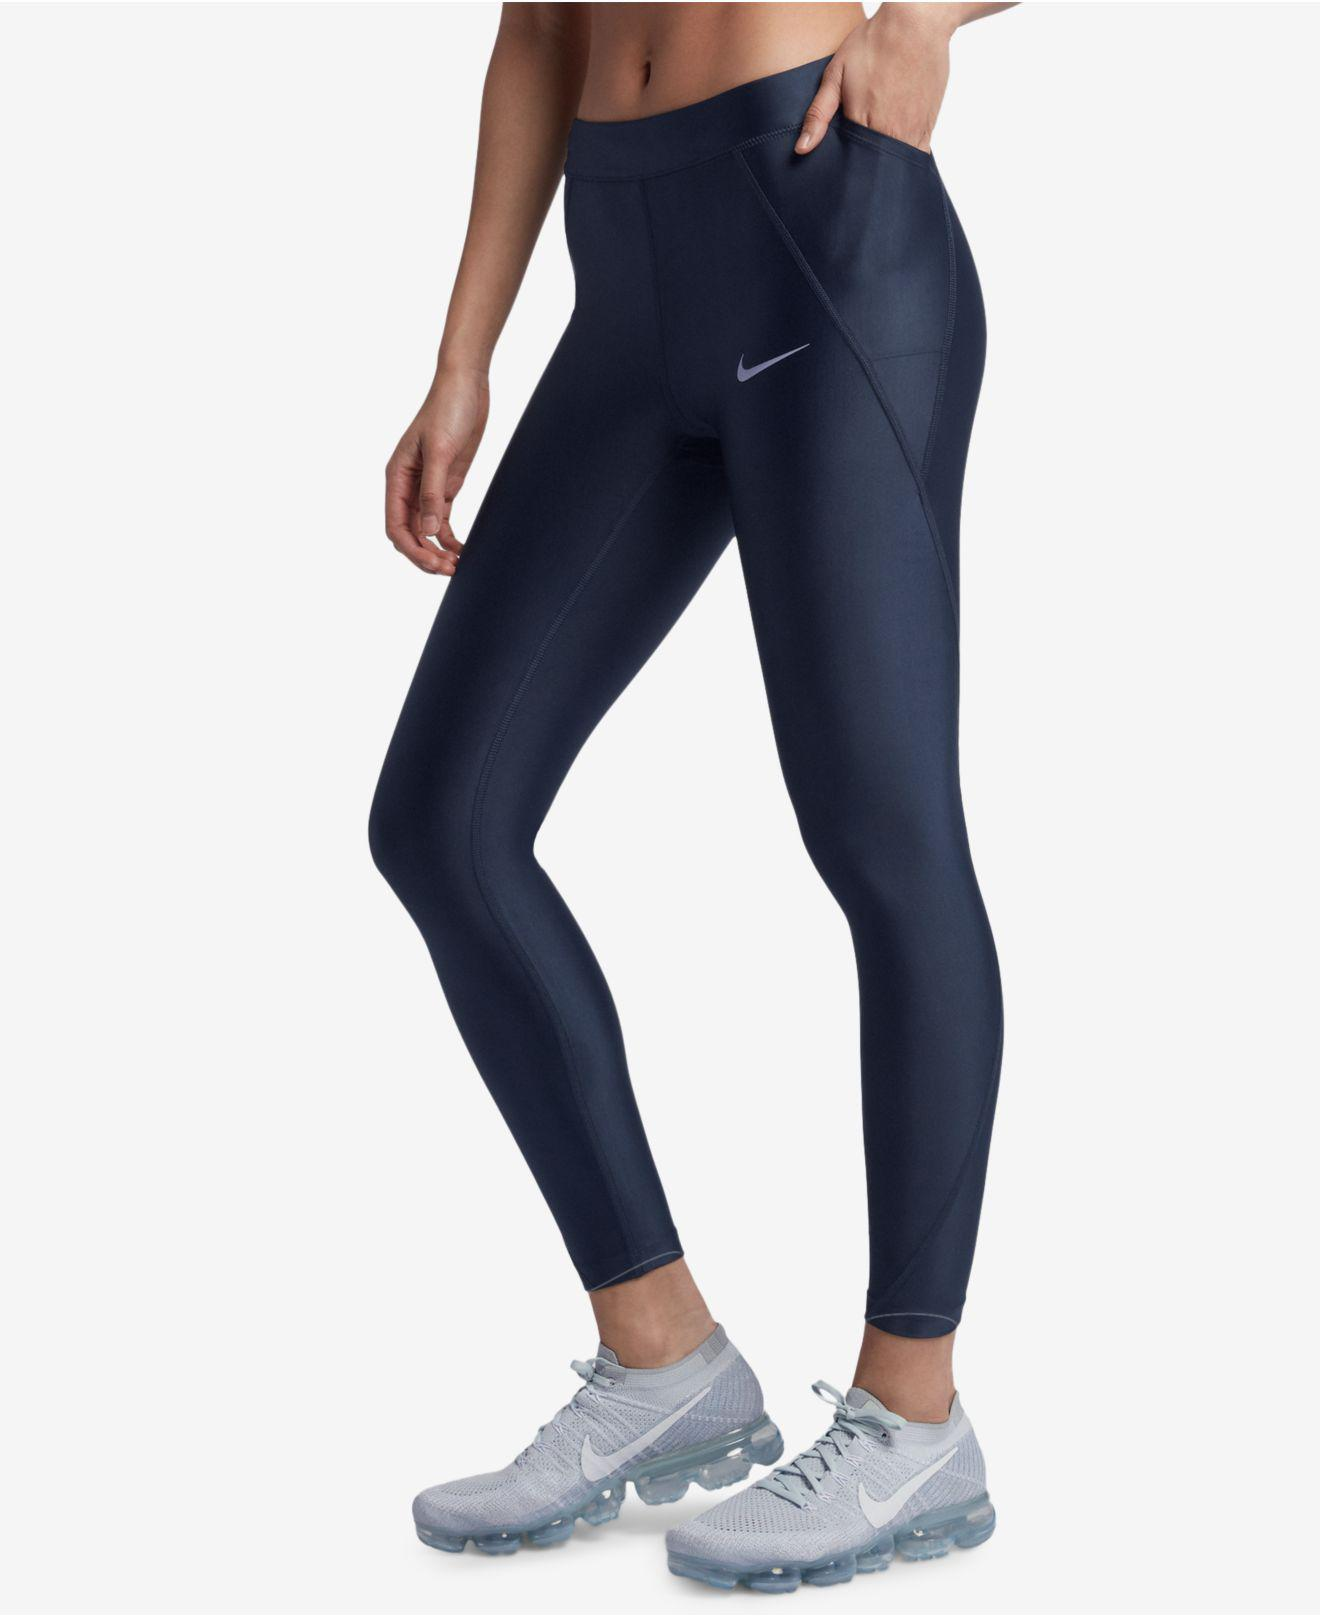 navy running leggings